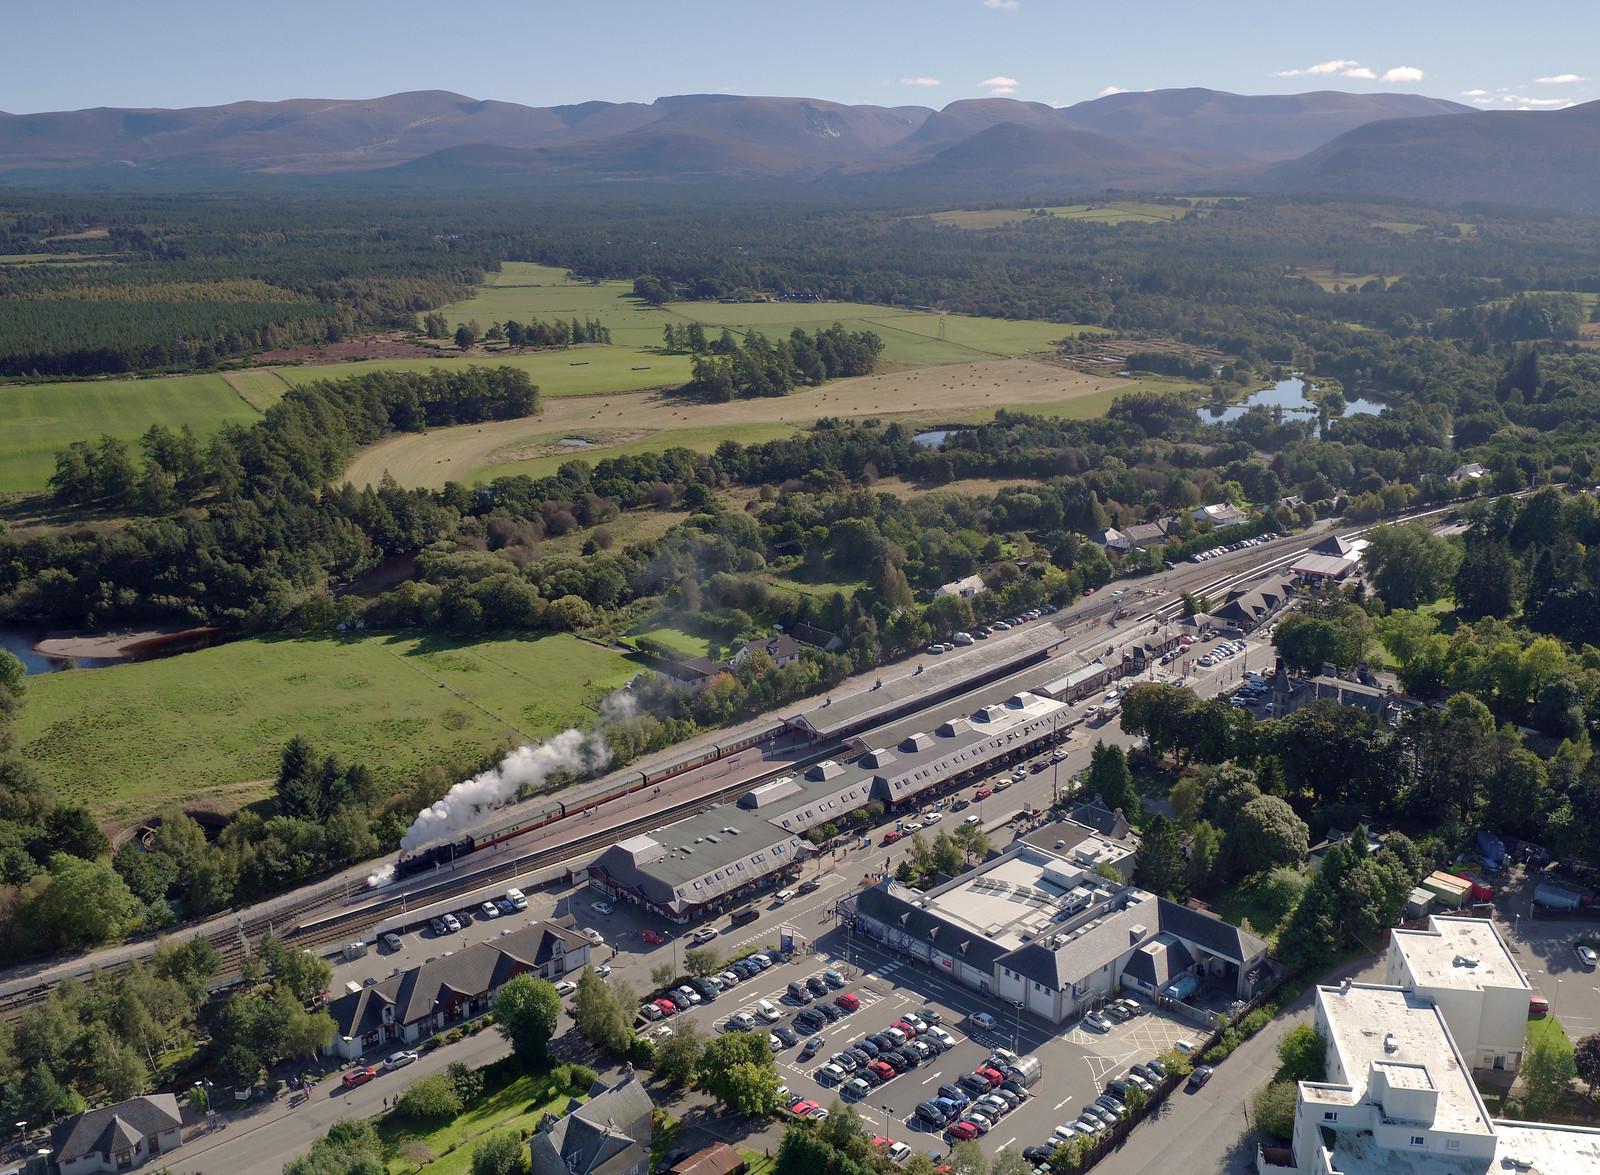 Aerial Scotland_image1